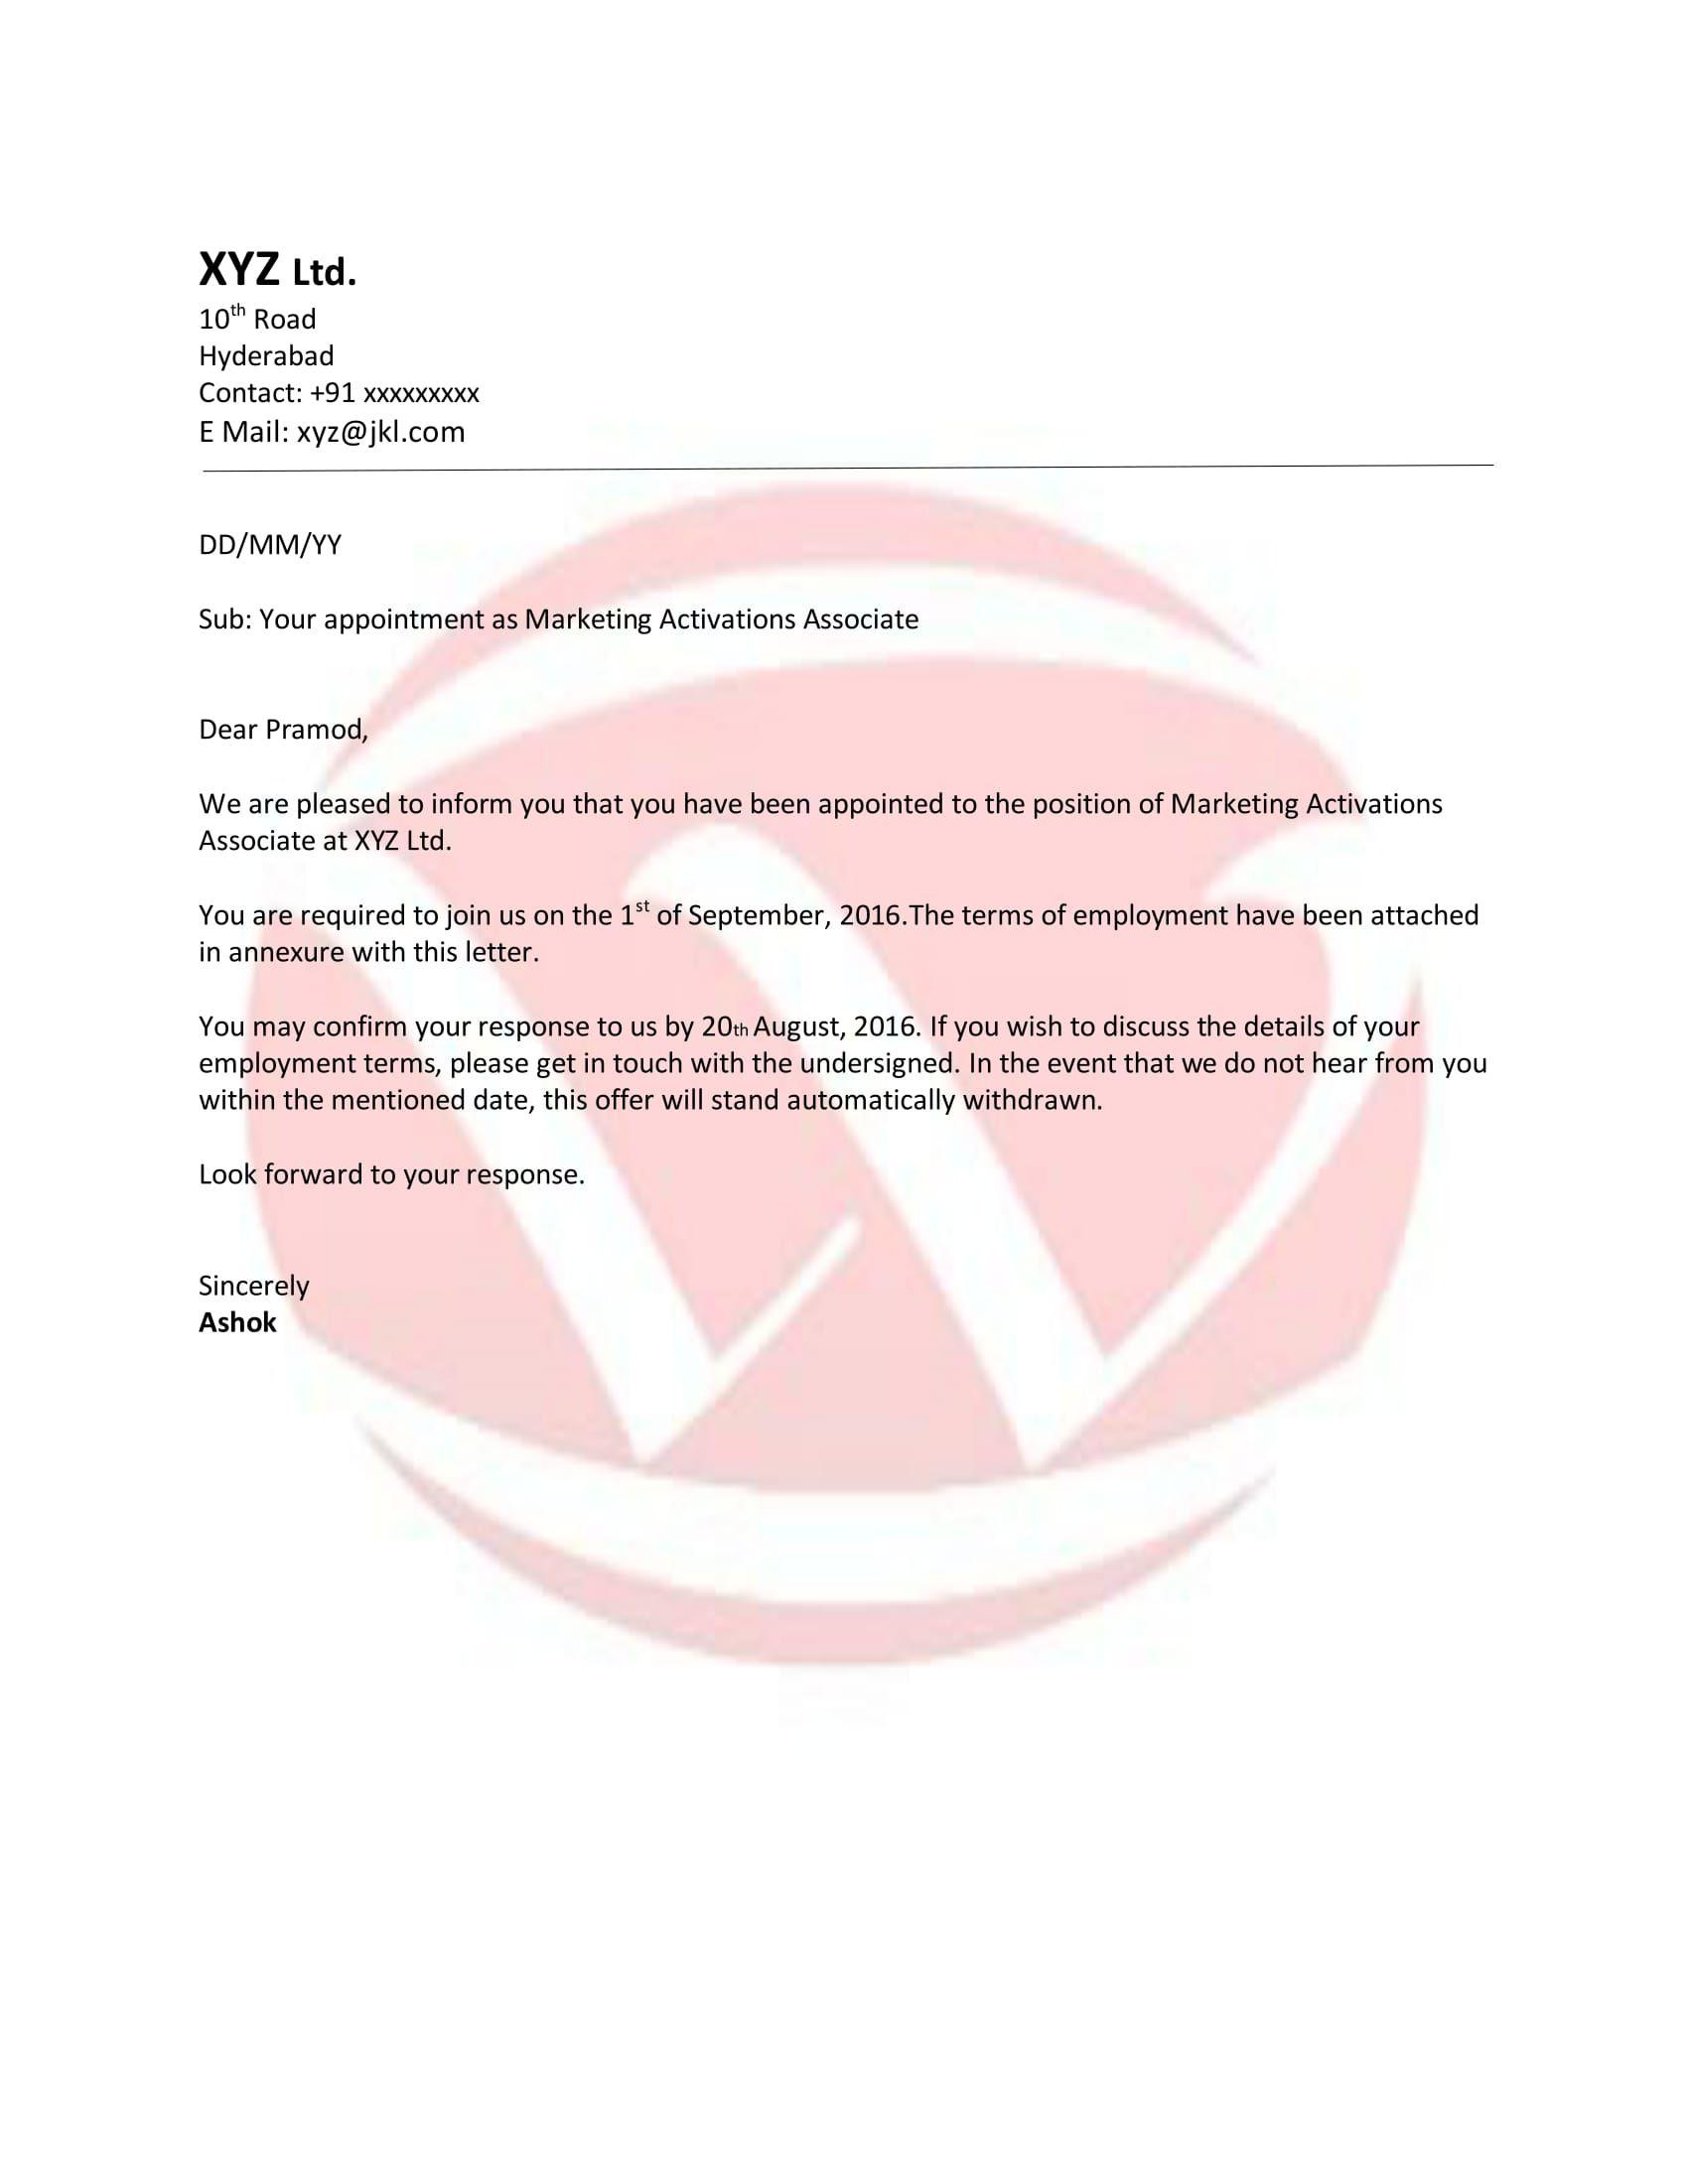 appointment letter format bangla joinning letter fotmat